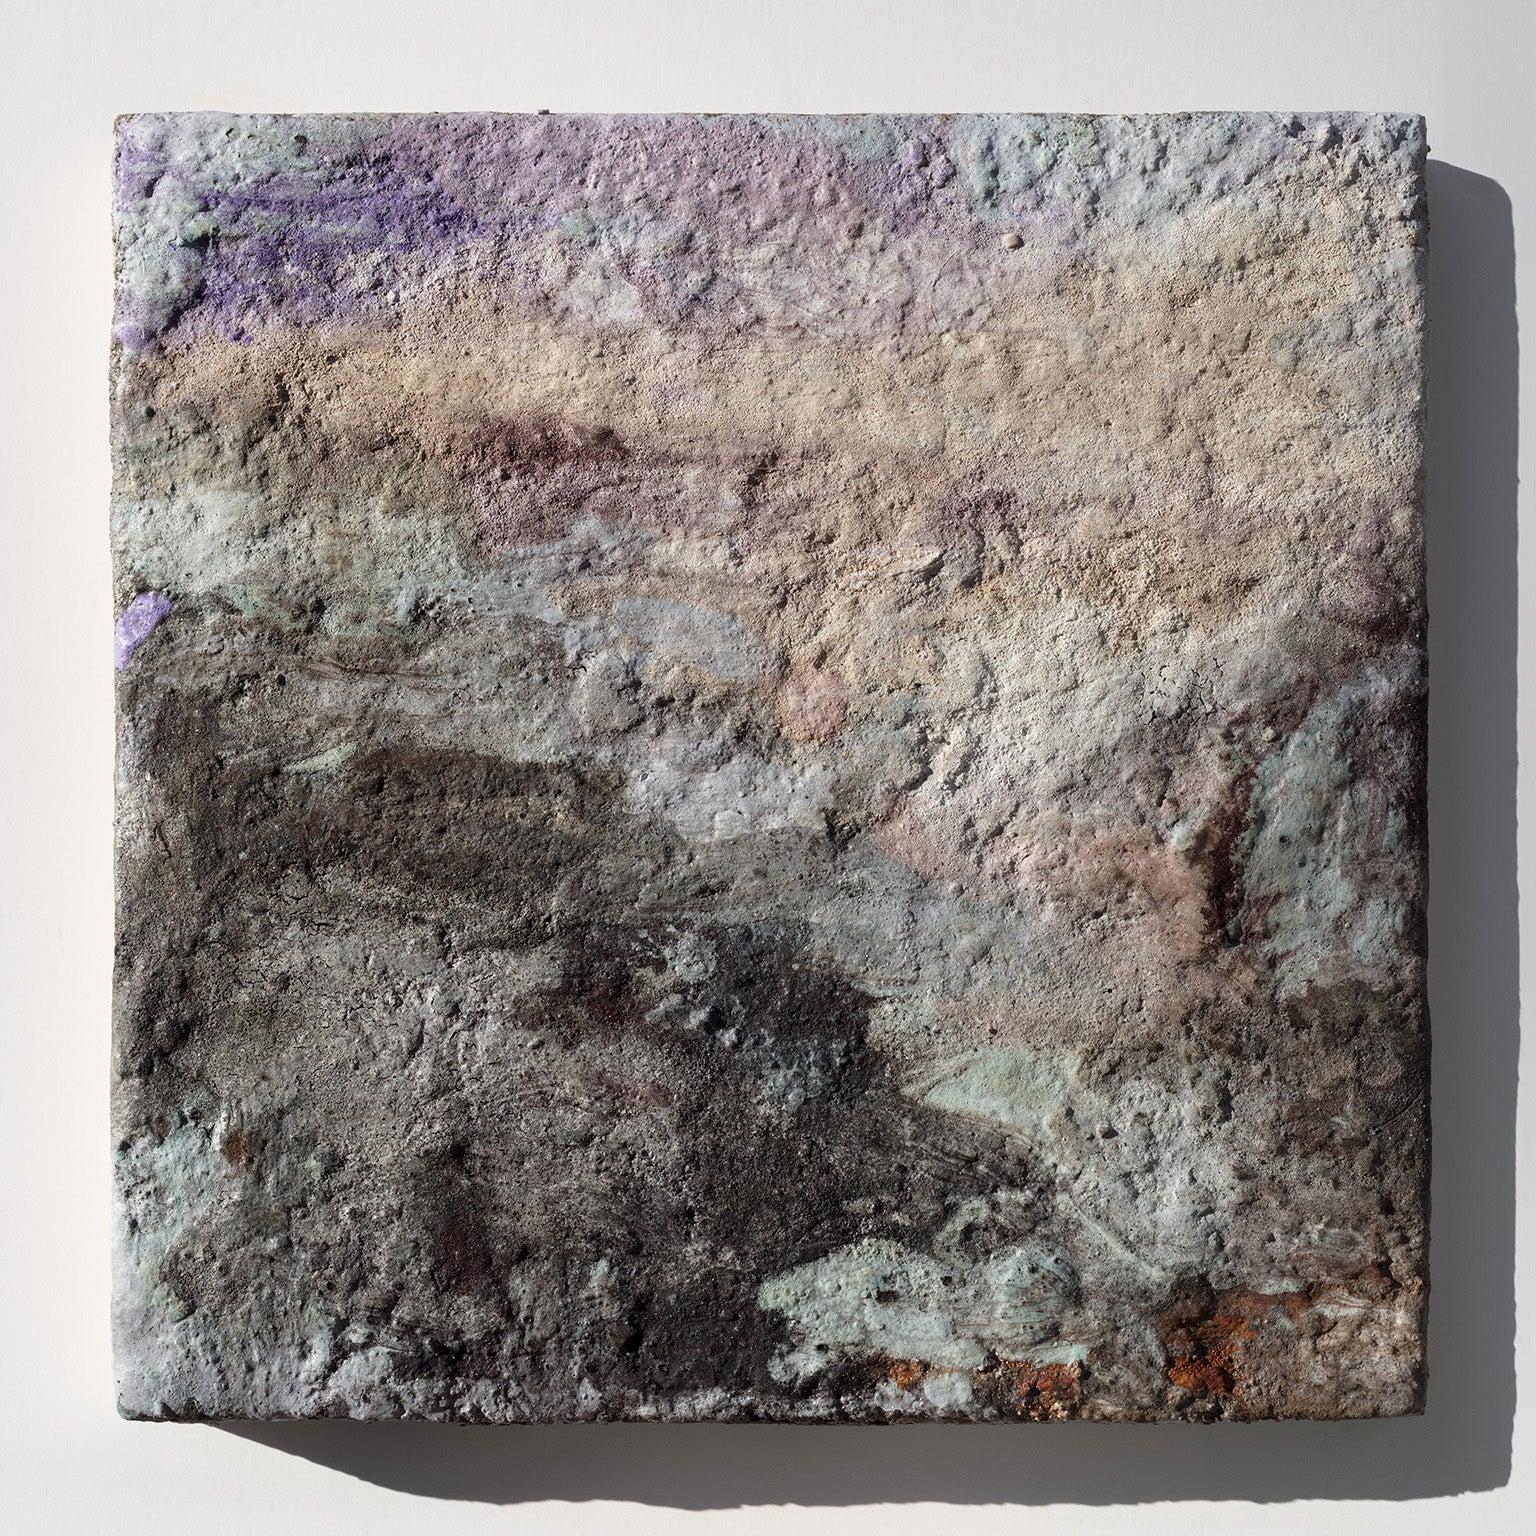 """Terra Bruciata - Alba II"" - Small Abstract Purple and Grey Painting"